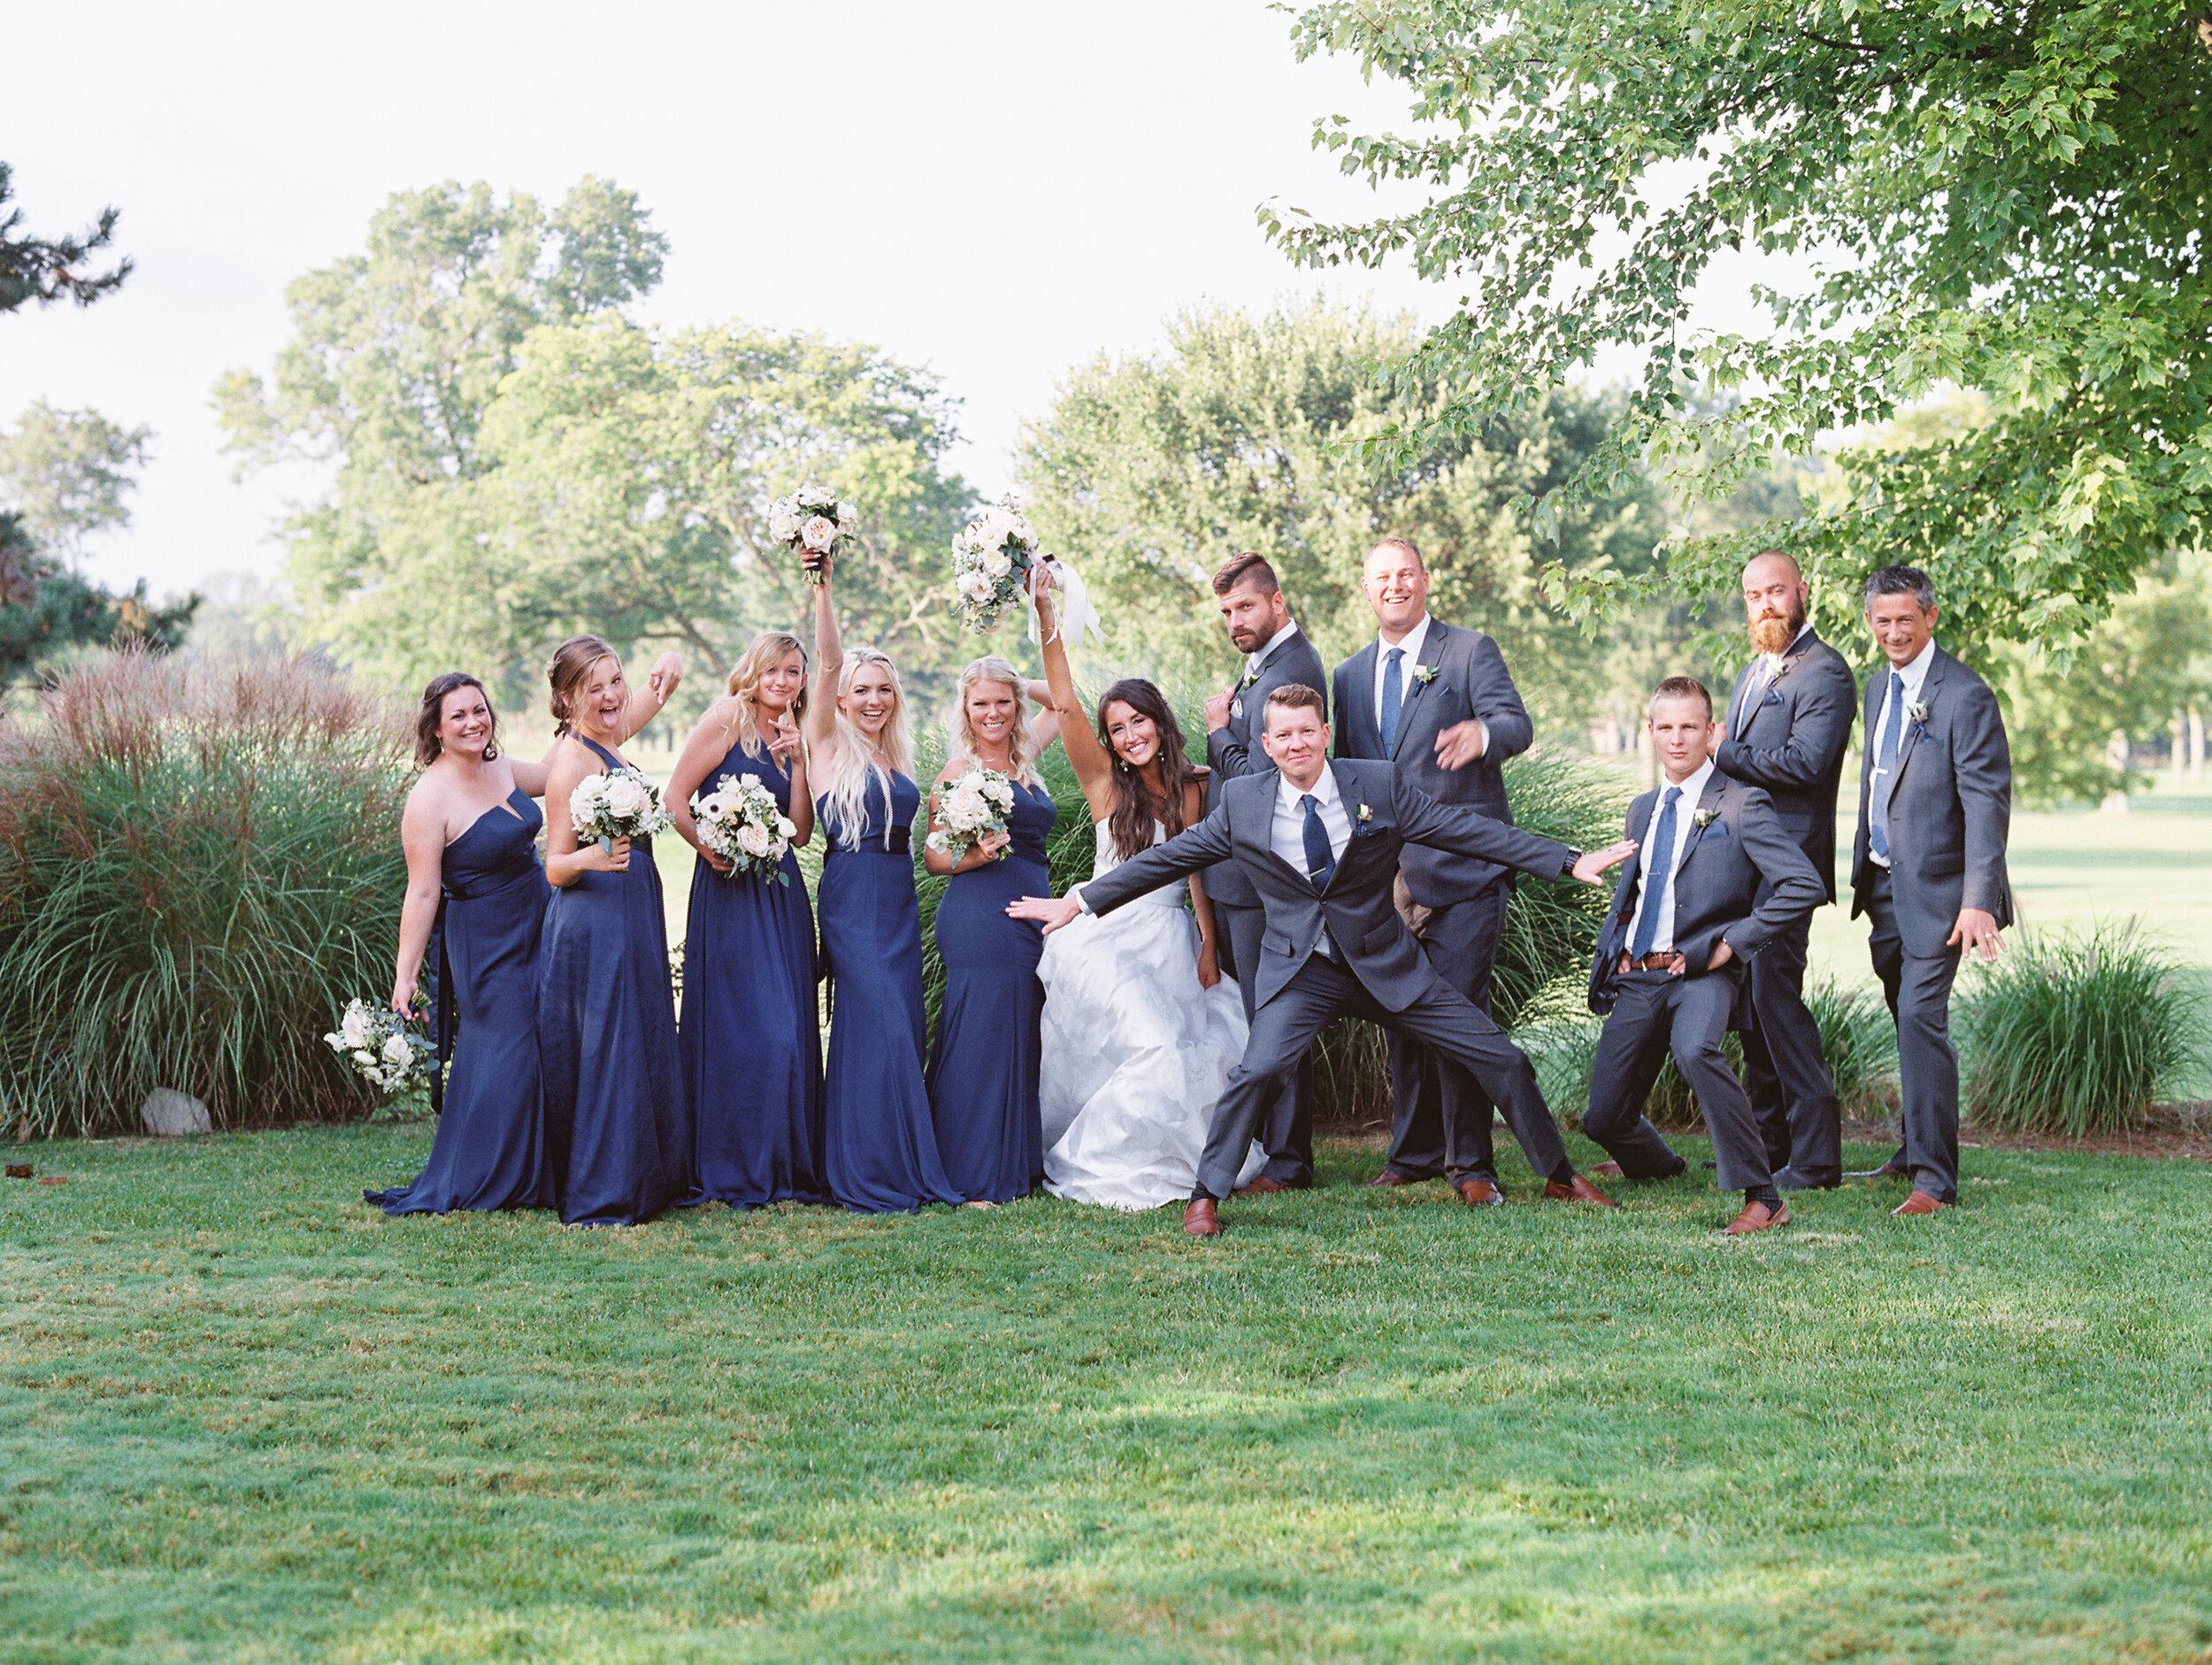 Kuiper+Wedding+Reception+Bridal+Party-125.jpg